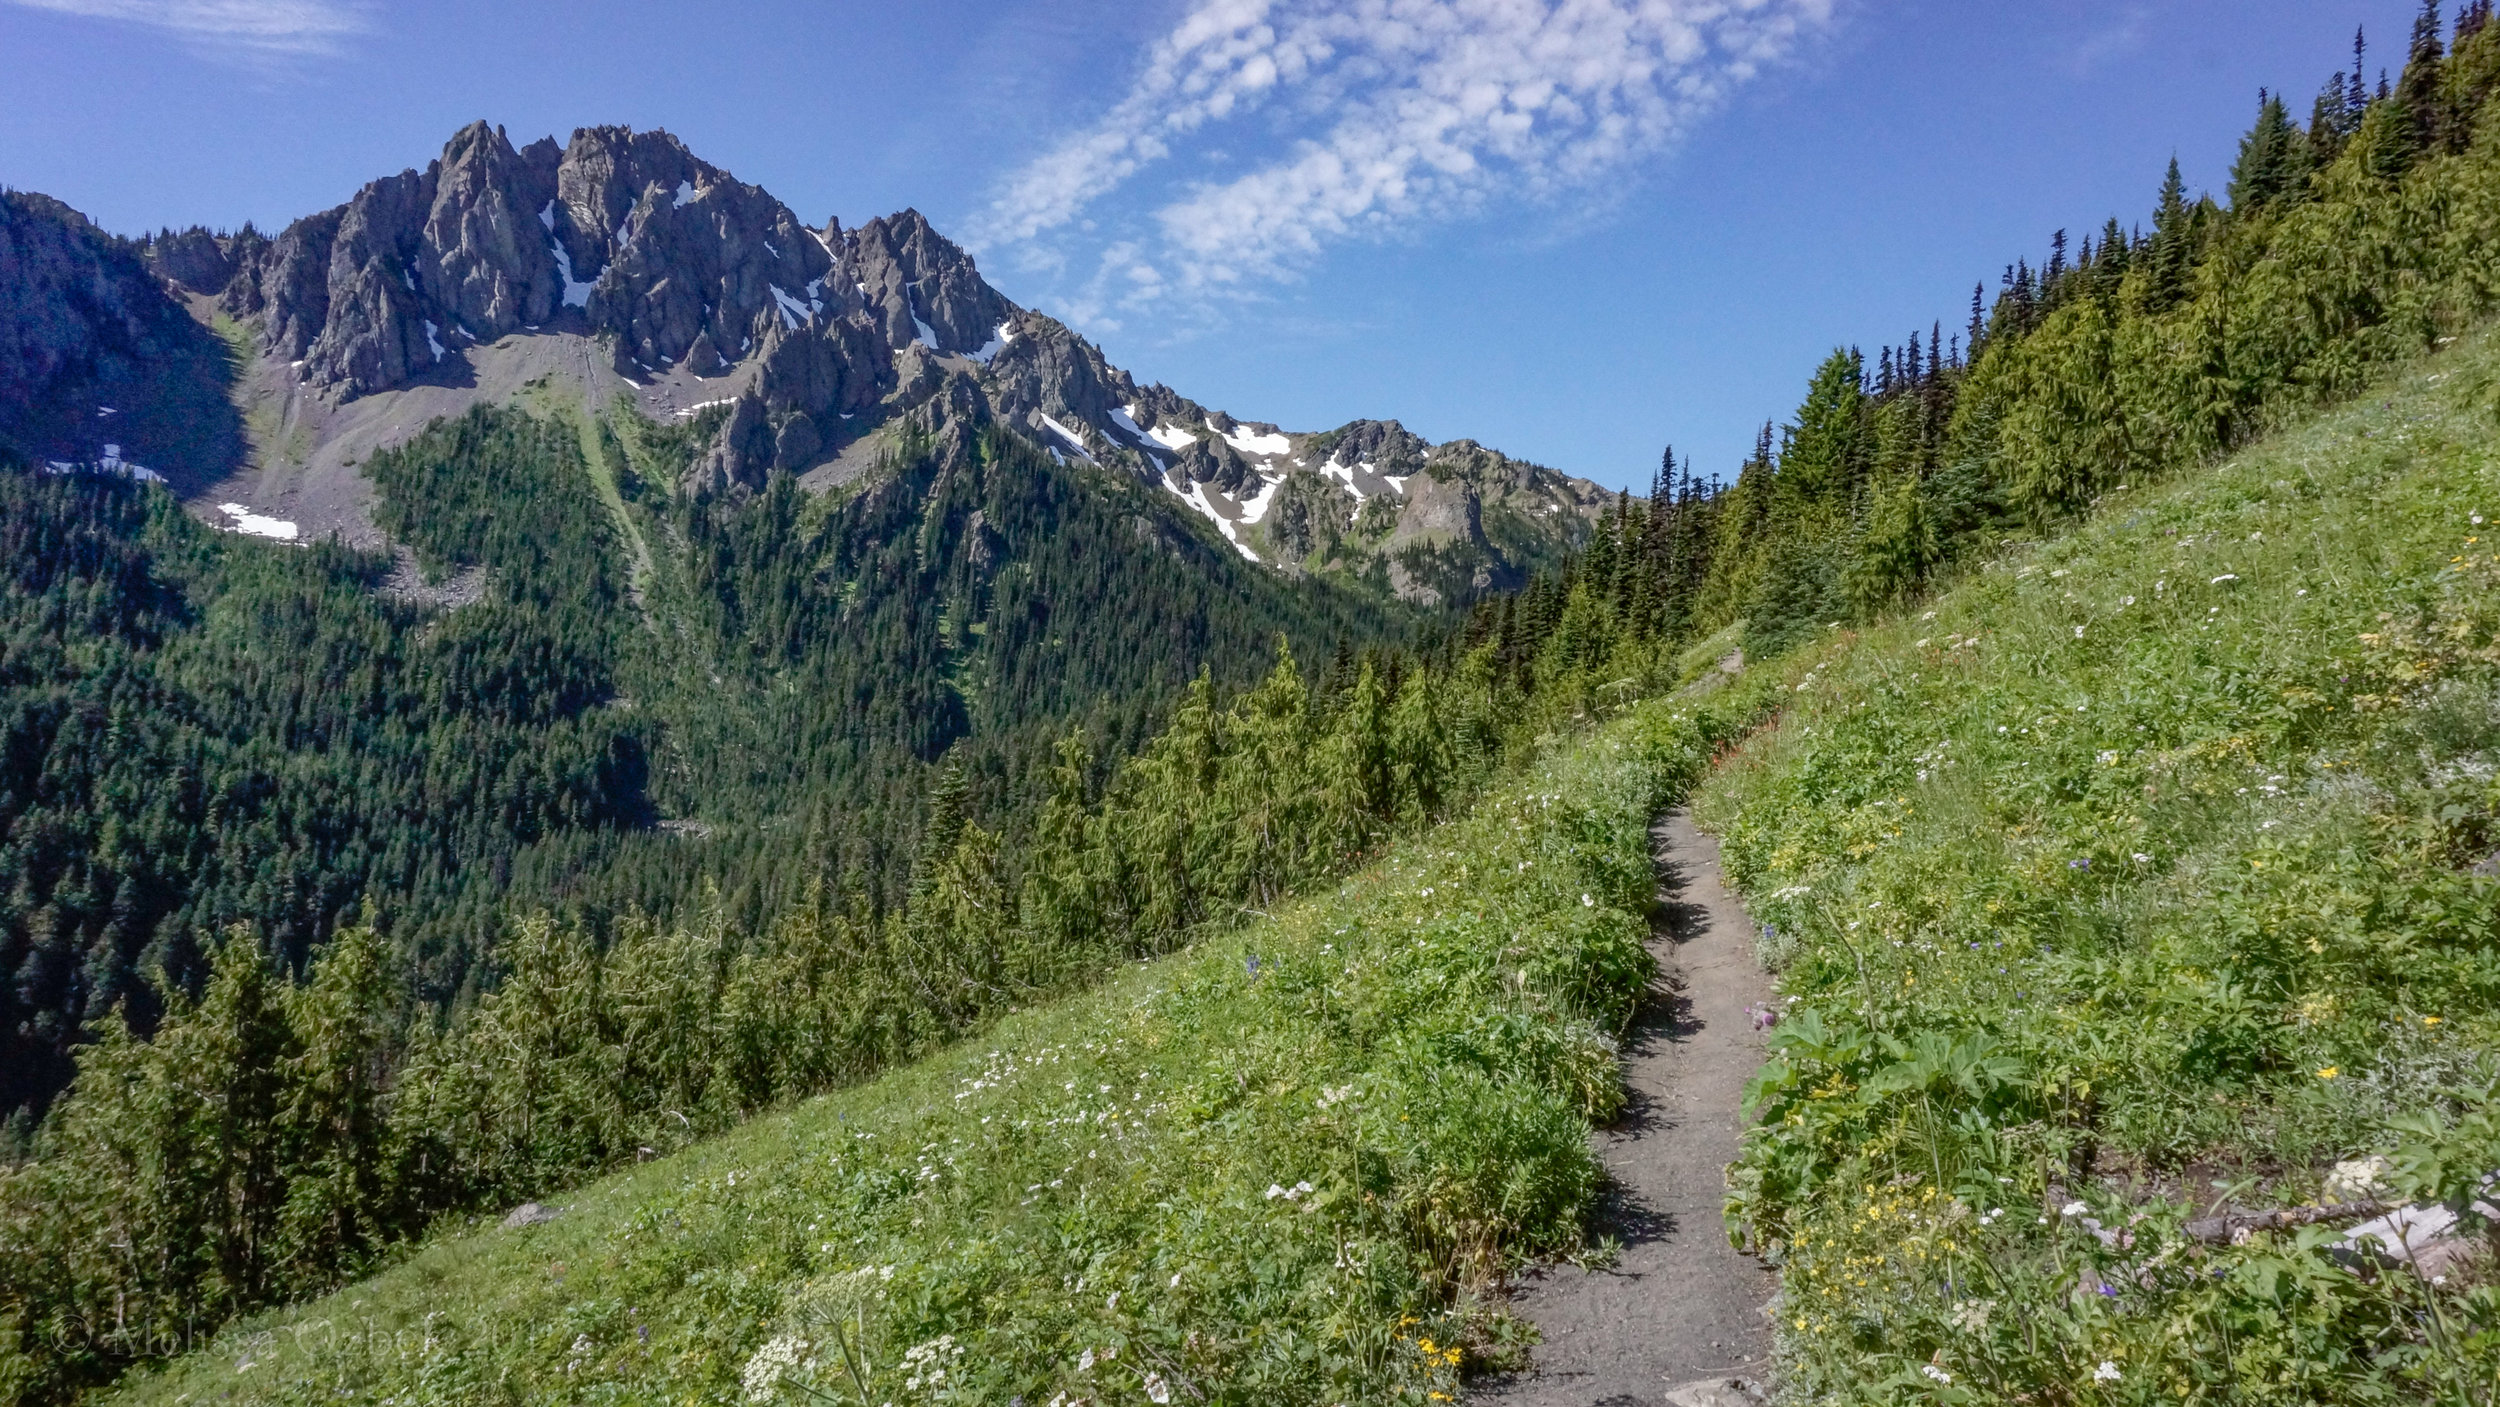 3. Upper Big Quilcene-Marmot Pass